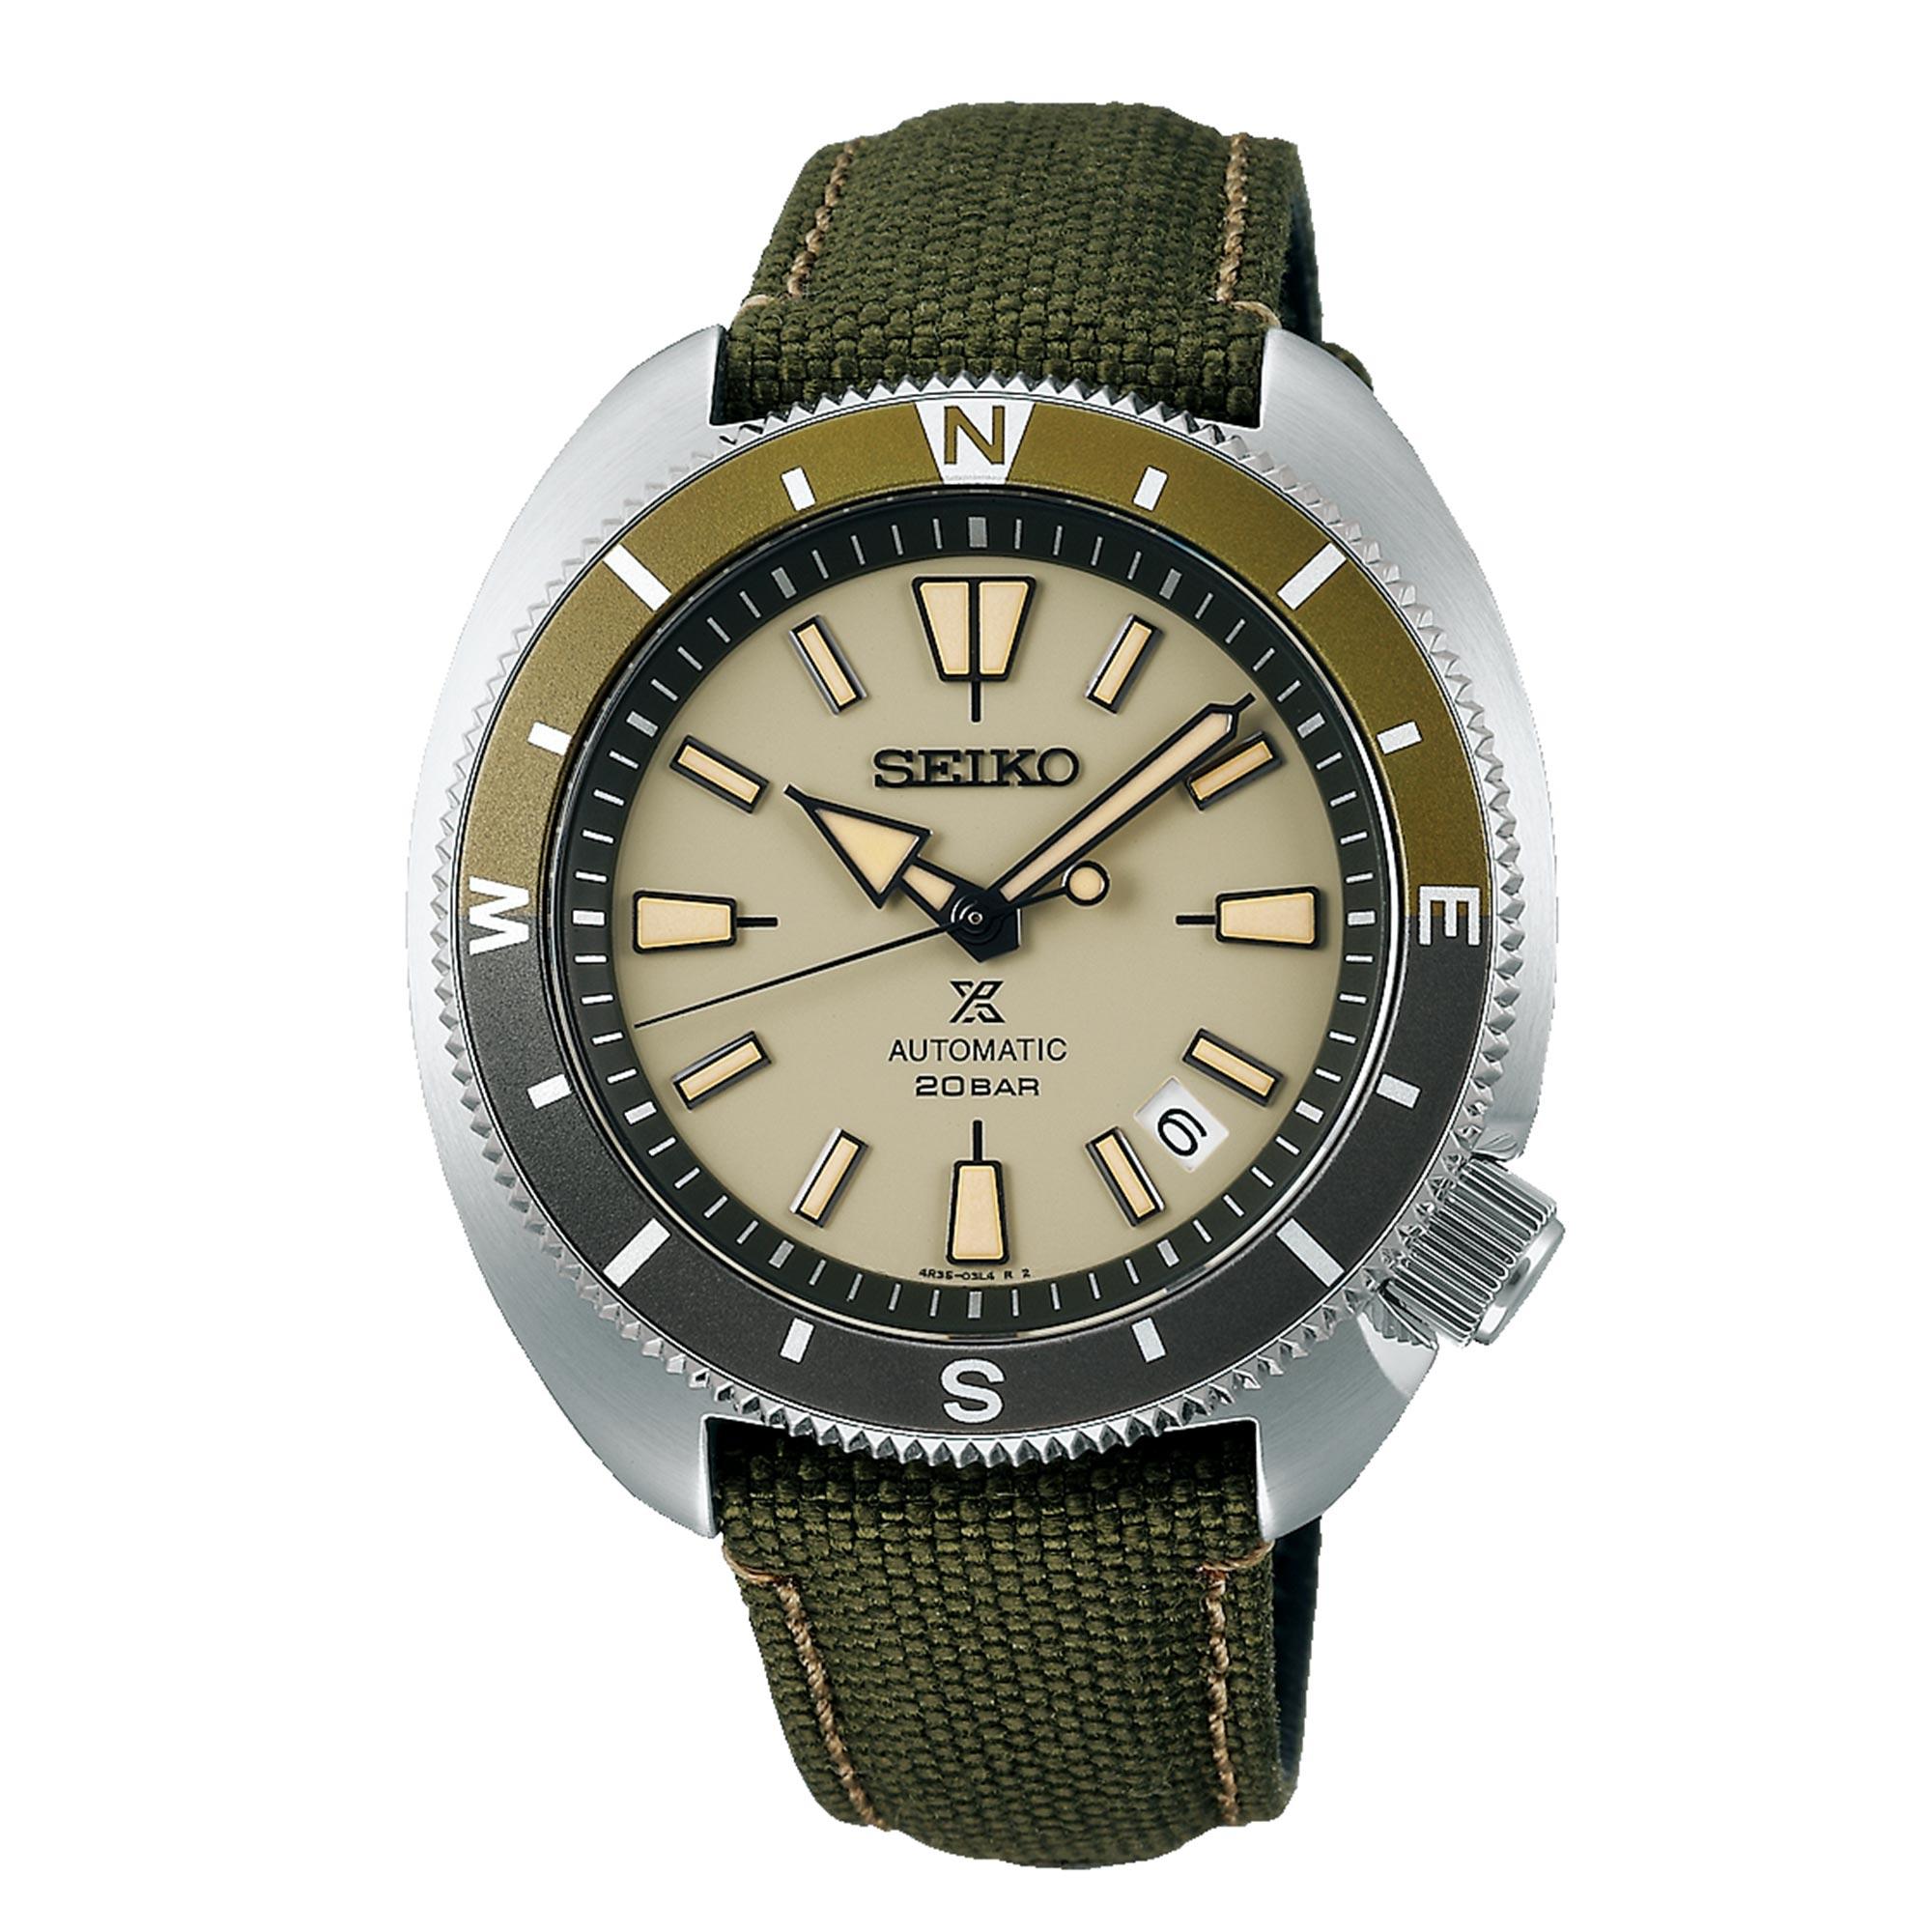 Seiko Prospex Tortoise Automatic Movement Tan Dial Polyester Bracelet Men's Watch SRPG13K1